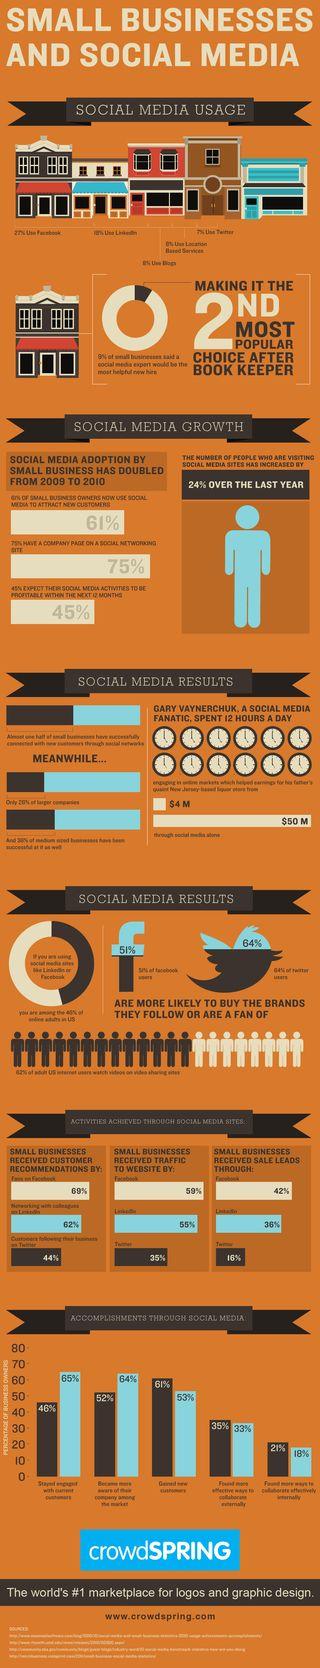 Small-business-social-media